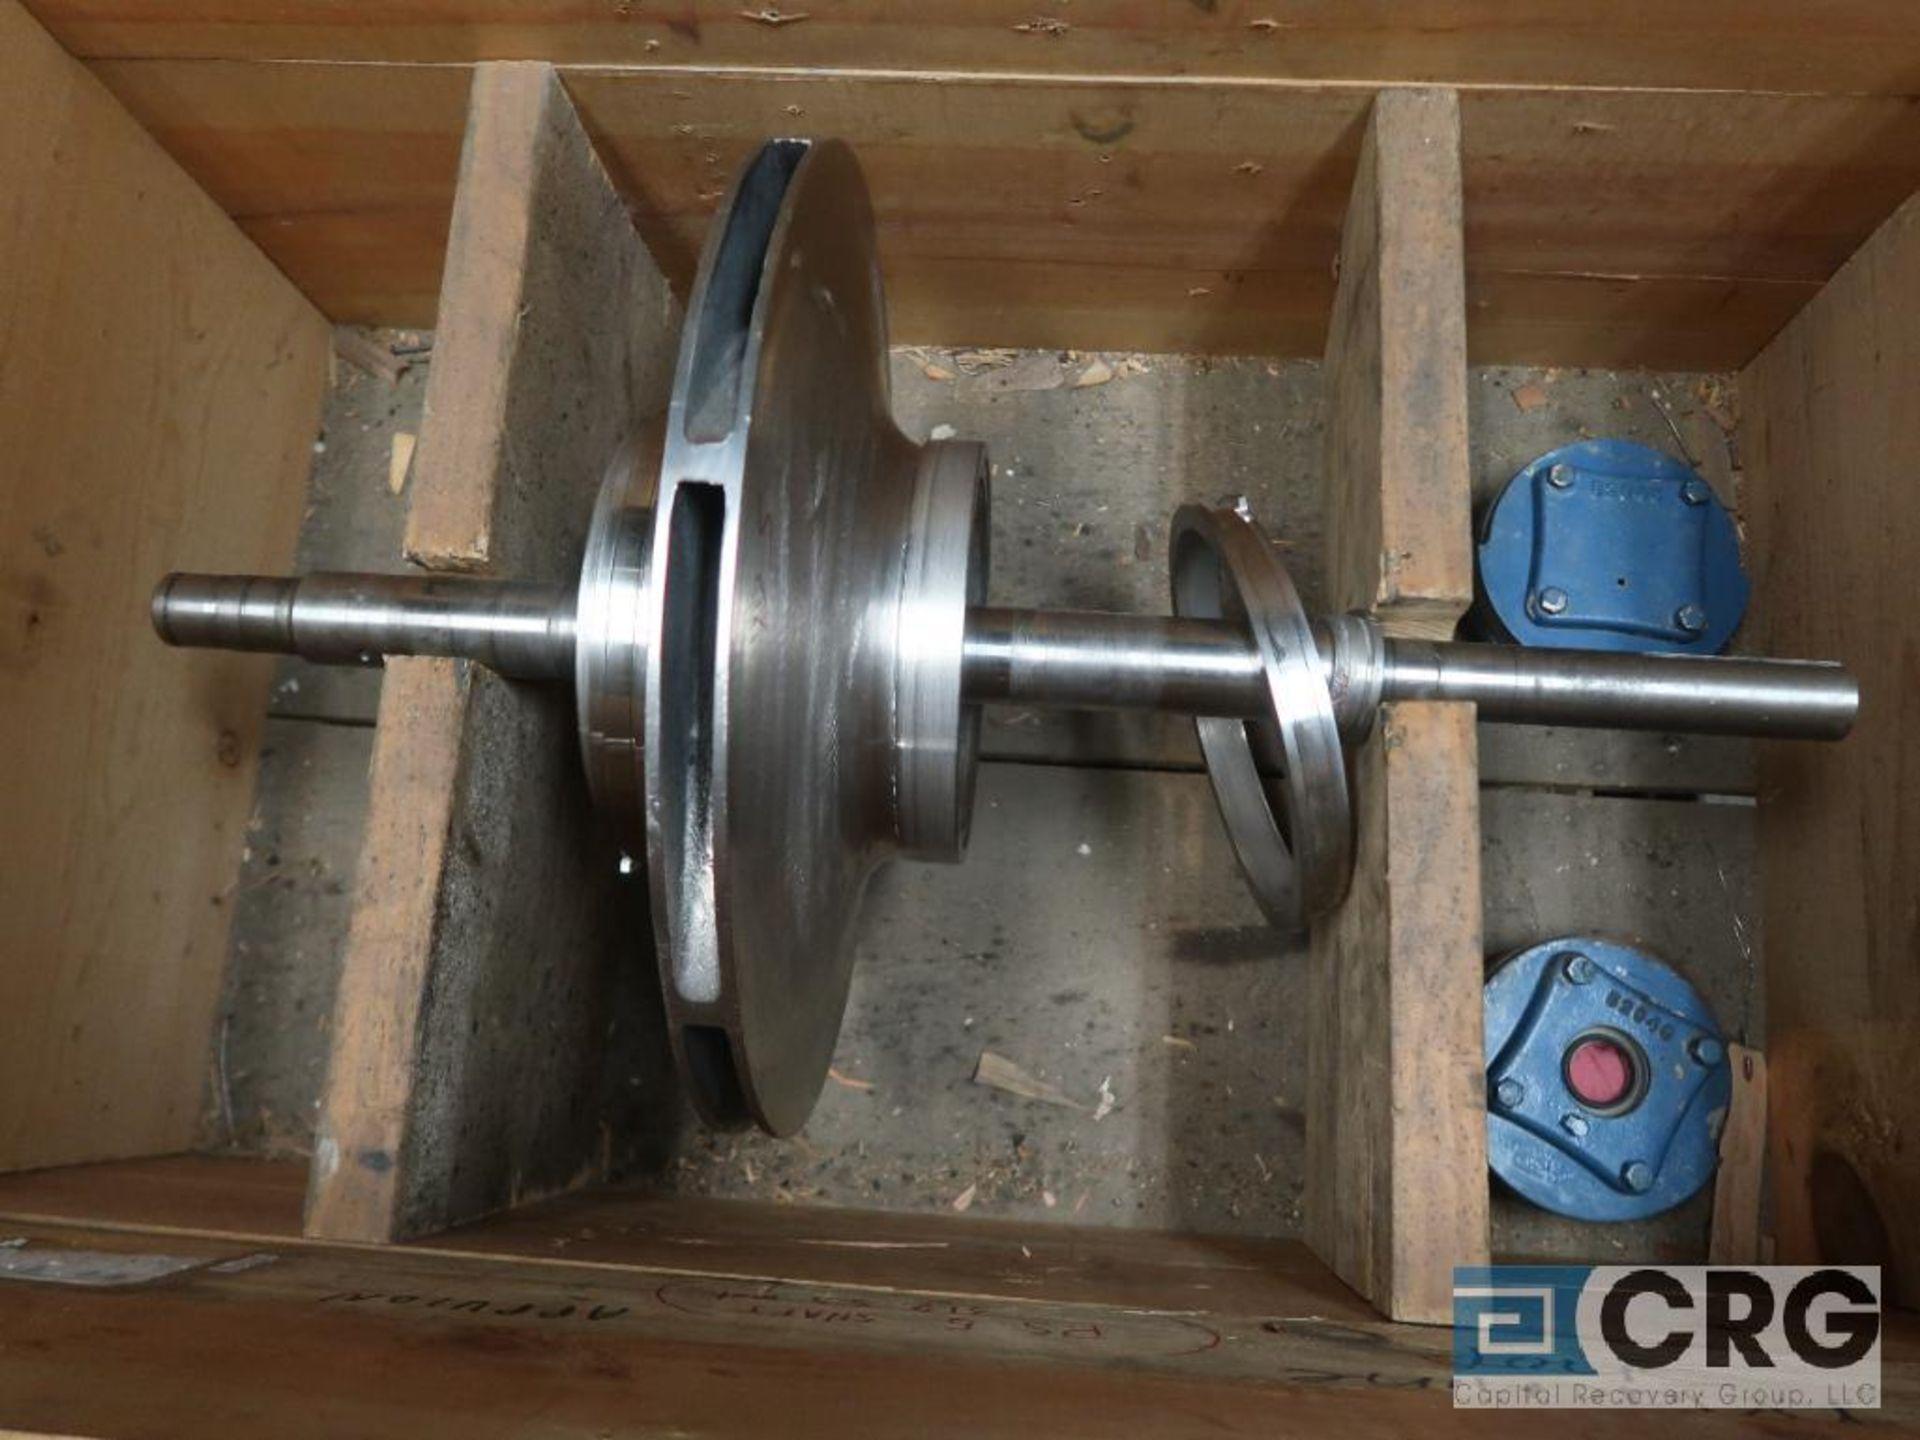 Goulds impeller assembly (Basement Stores)